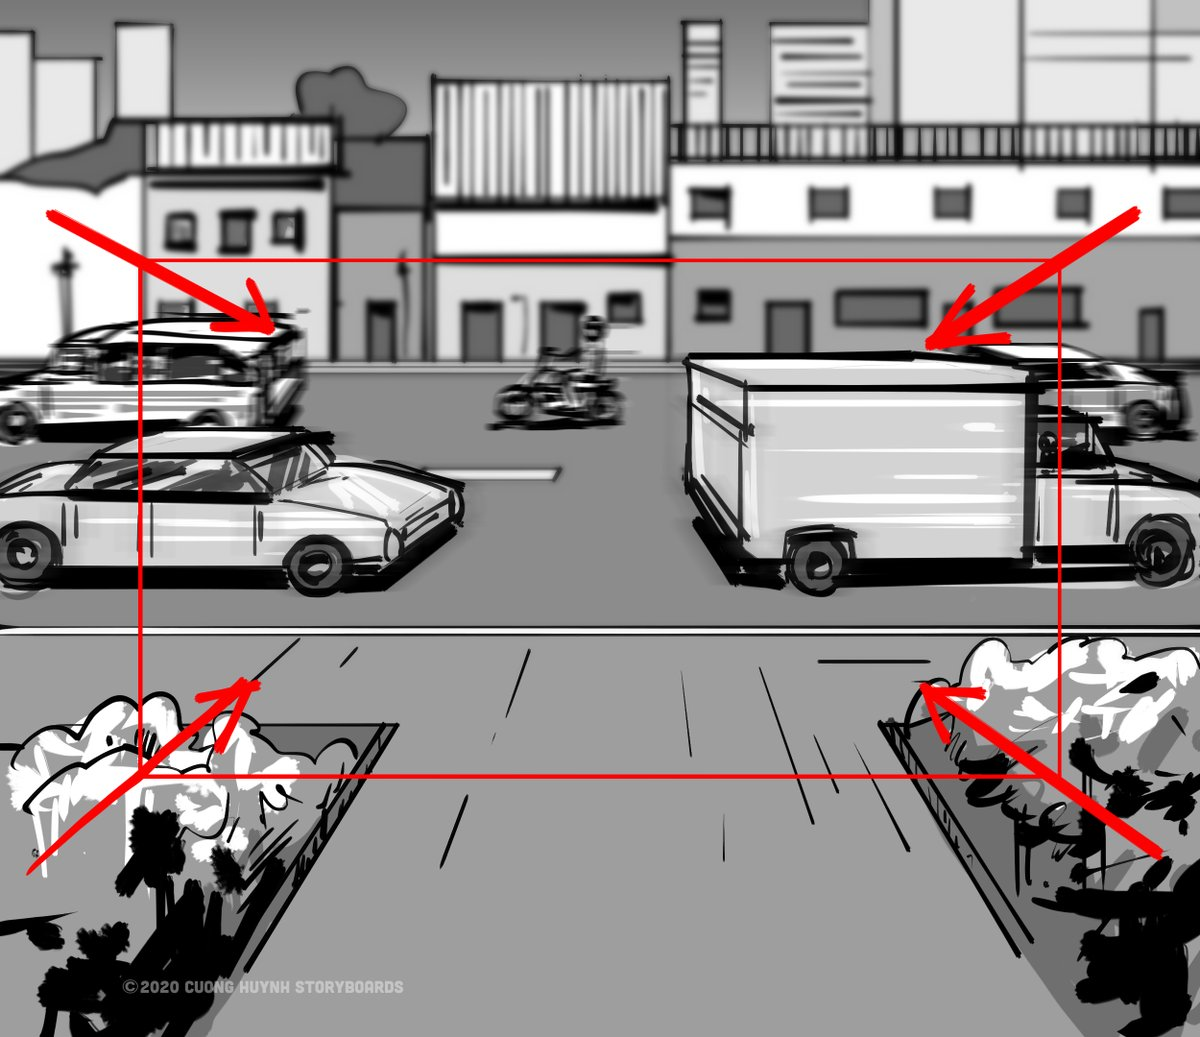 Frame 09 EP03: POV - GF exits hospital doors, walks out to the street/curb. #storyboard #artist #storyboarding #storyboards #drawing #drawings #films #filmdirector #director #filmcrew #filmmaking #filmmaker #preproduction #conceptart #filmproduction #illustrator #illustration